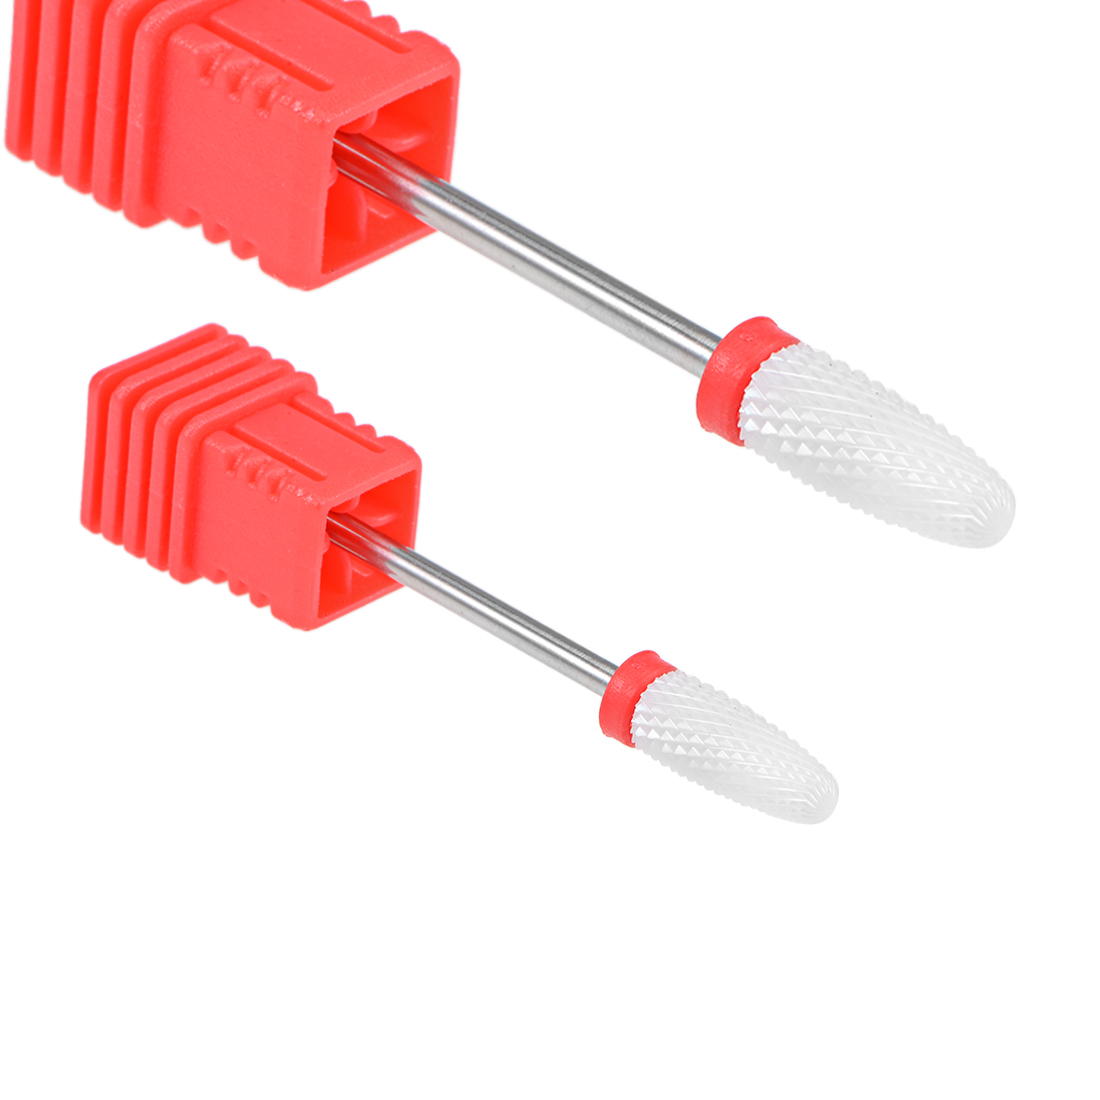 2pcs Ceramic Nail Drill Bits 3/32 inch (Fine Grit) Cuticle Nails File Bit